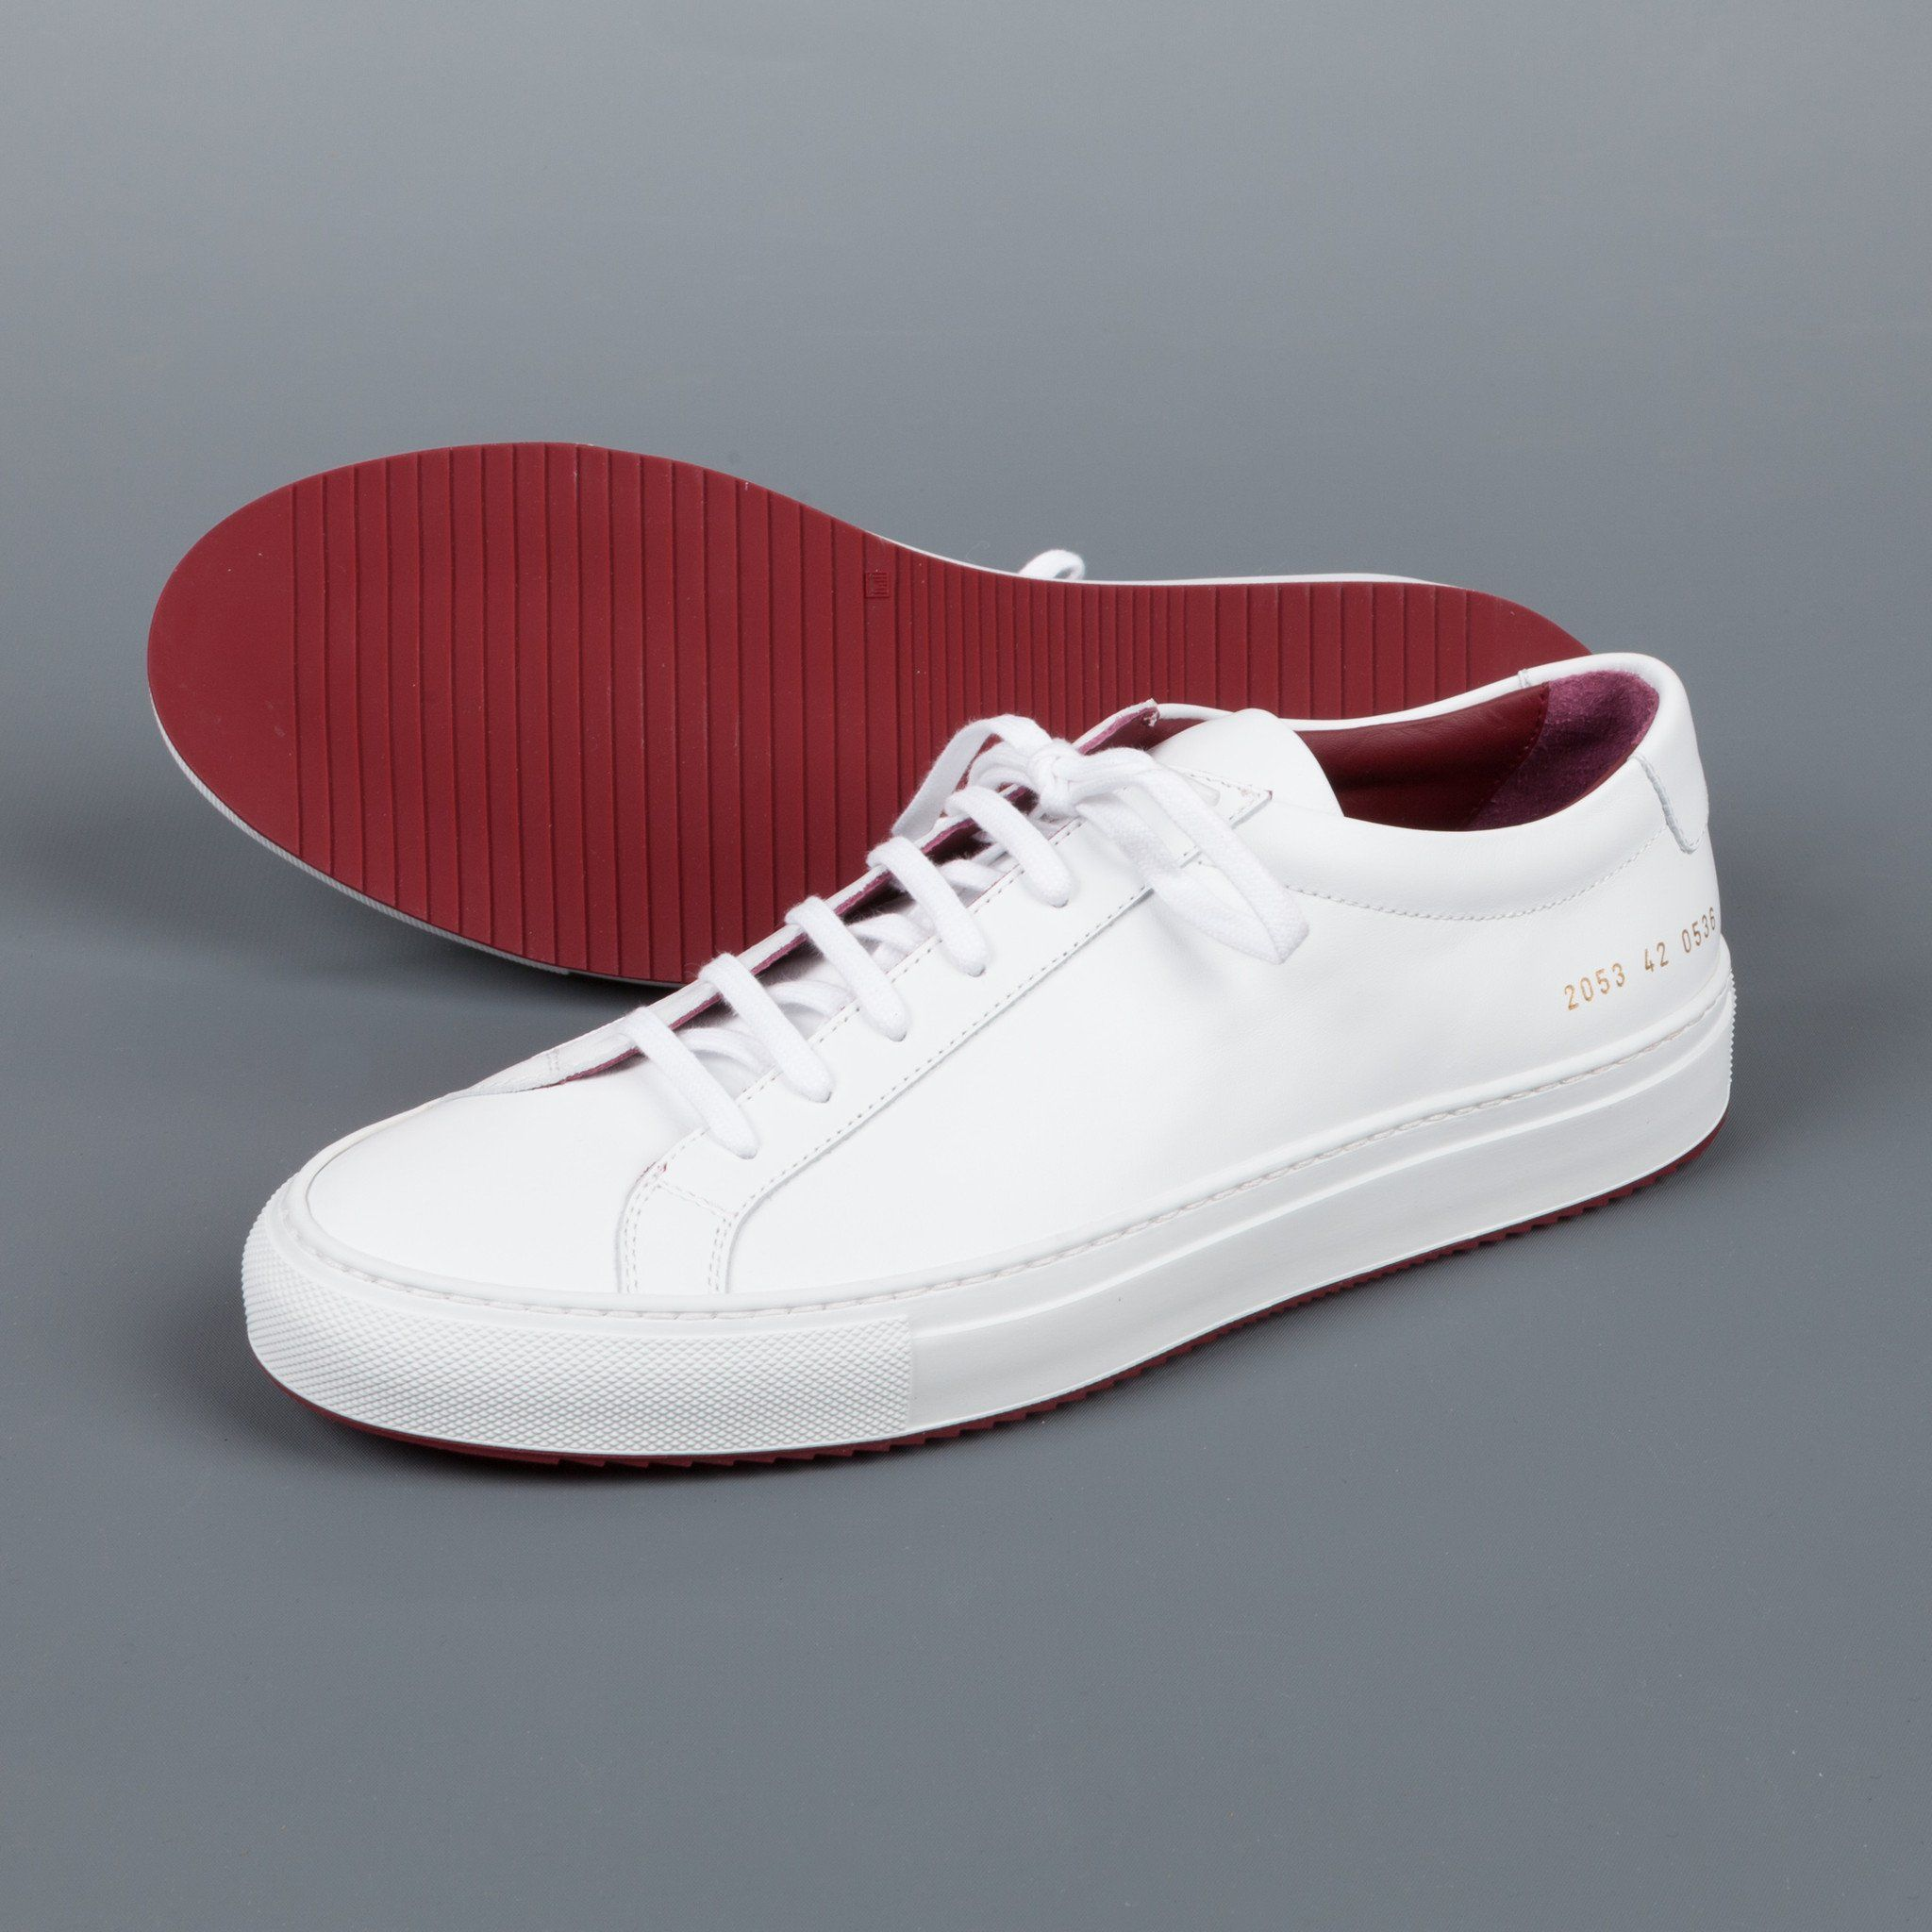 Sneakers white, Sneakers men